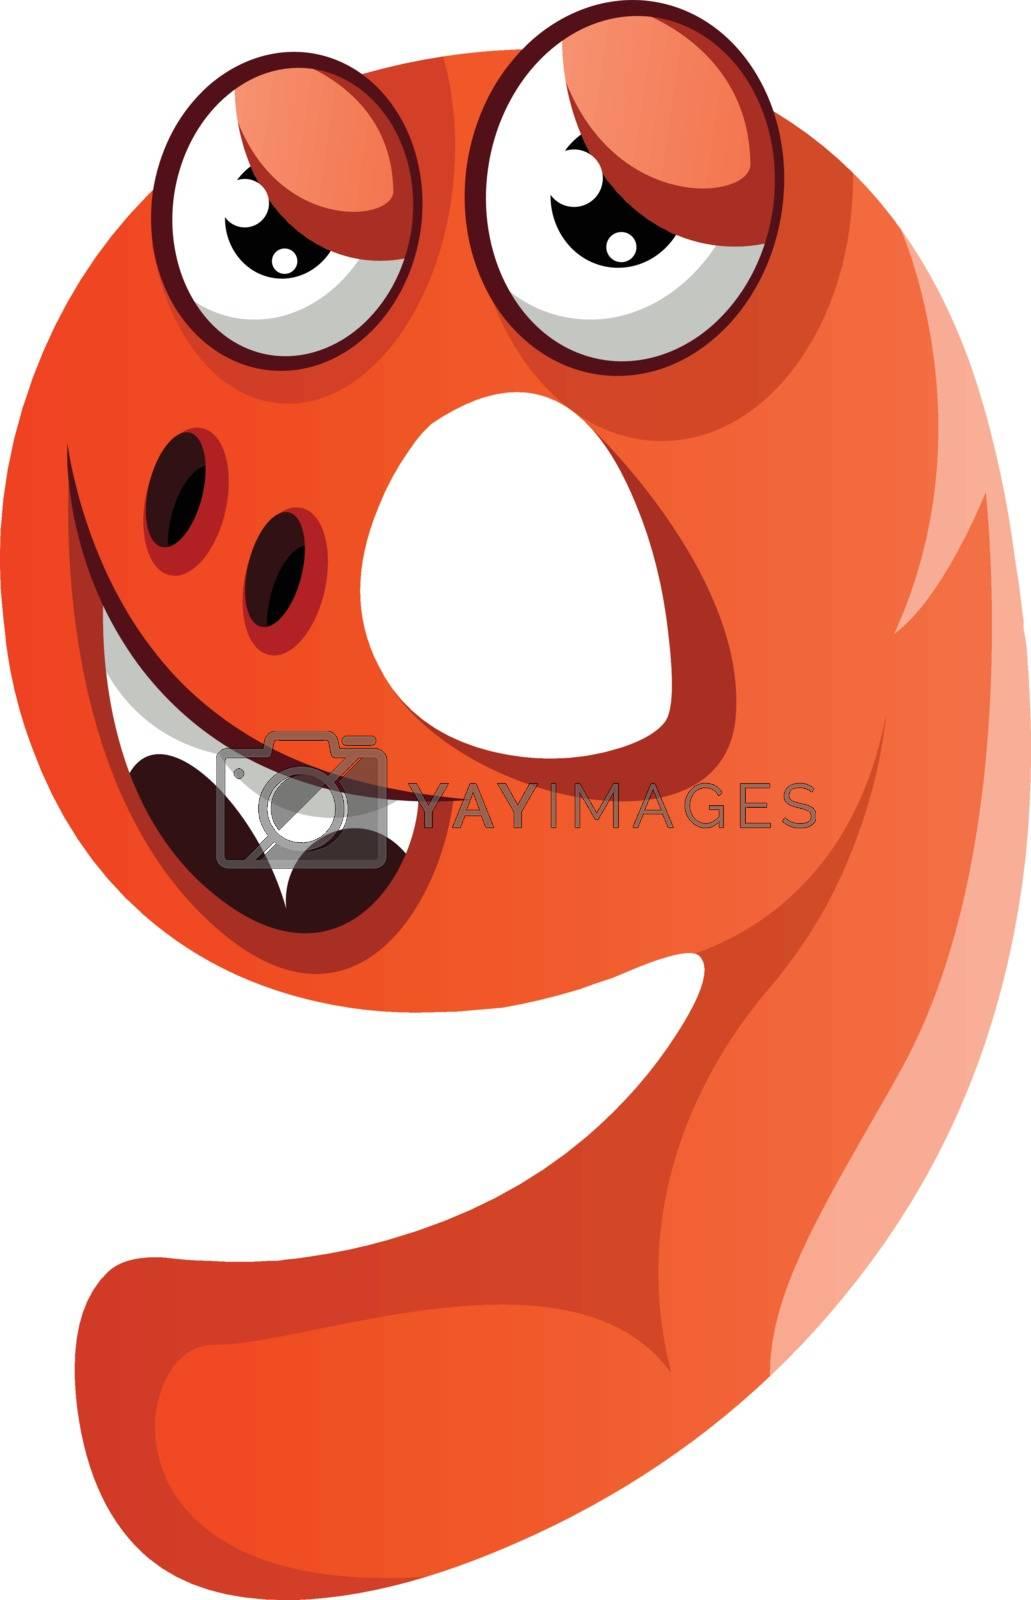 Royalty free image of Orange monster in number nine shape illustration vector on white by Morphart